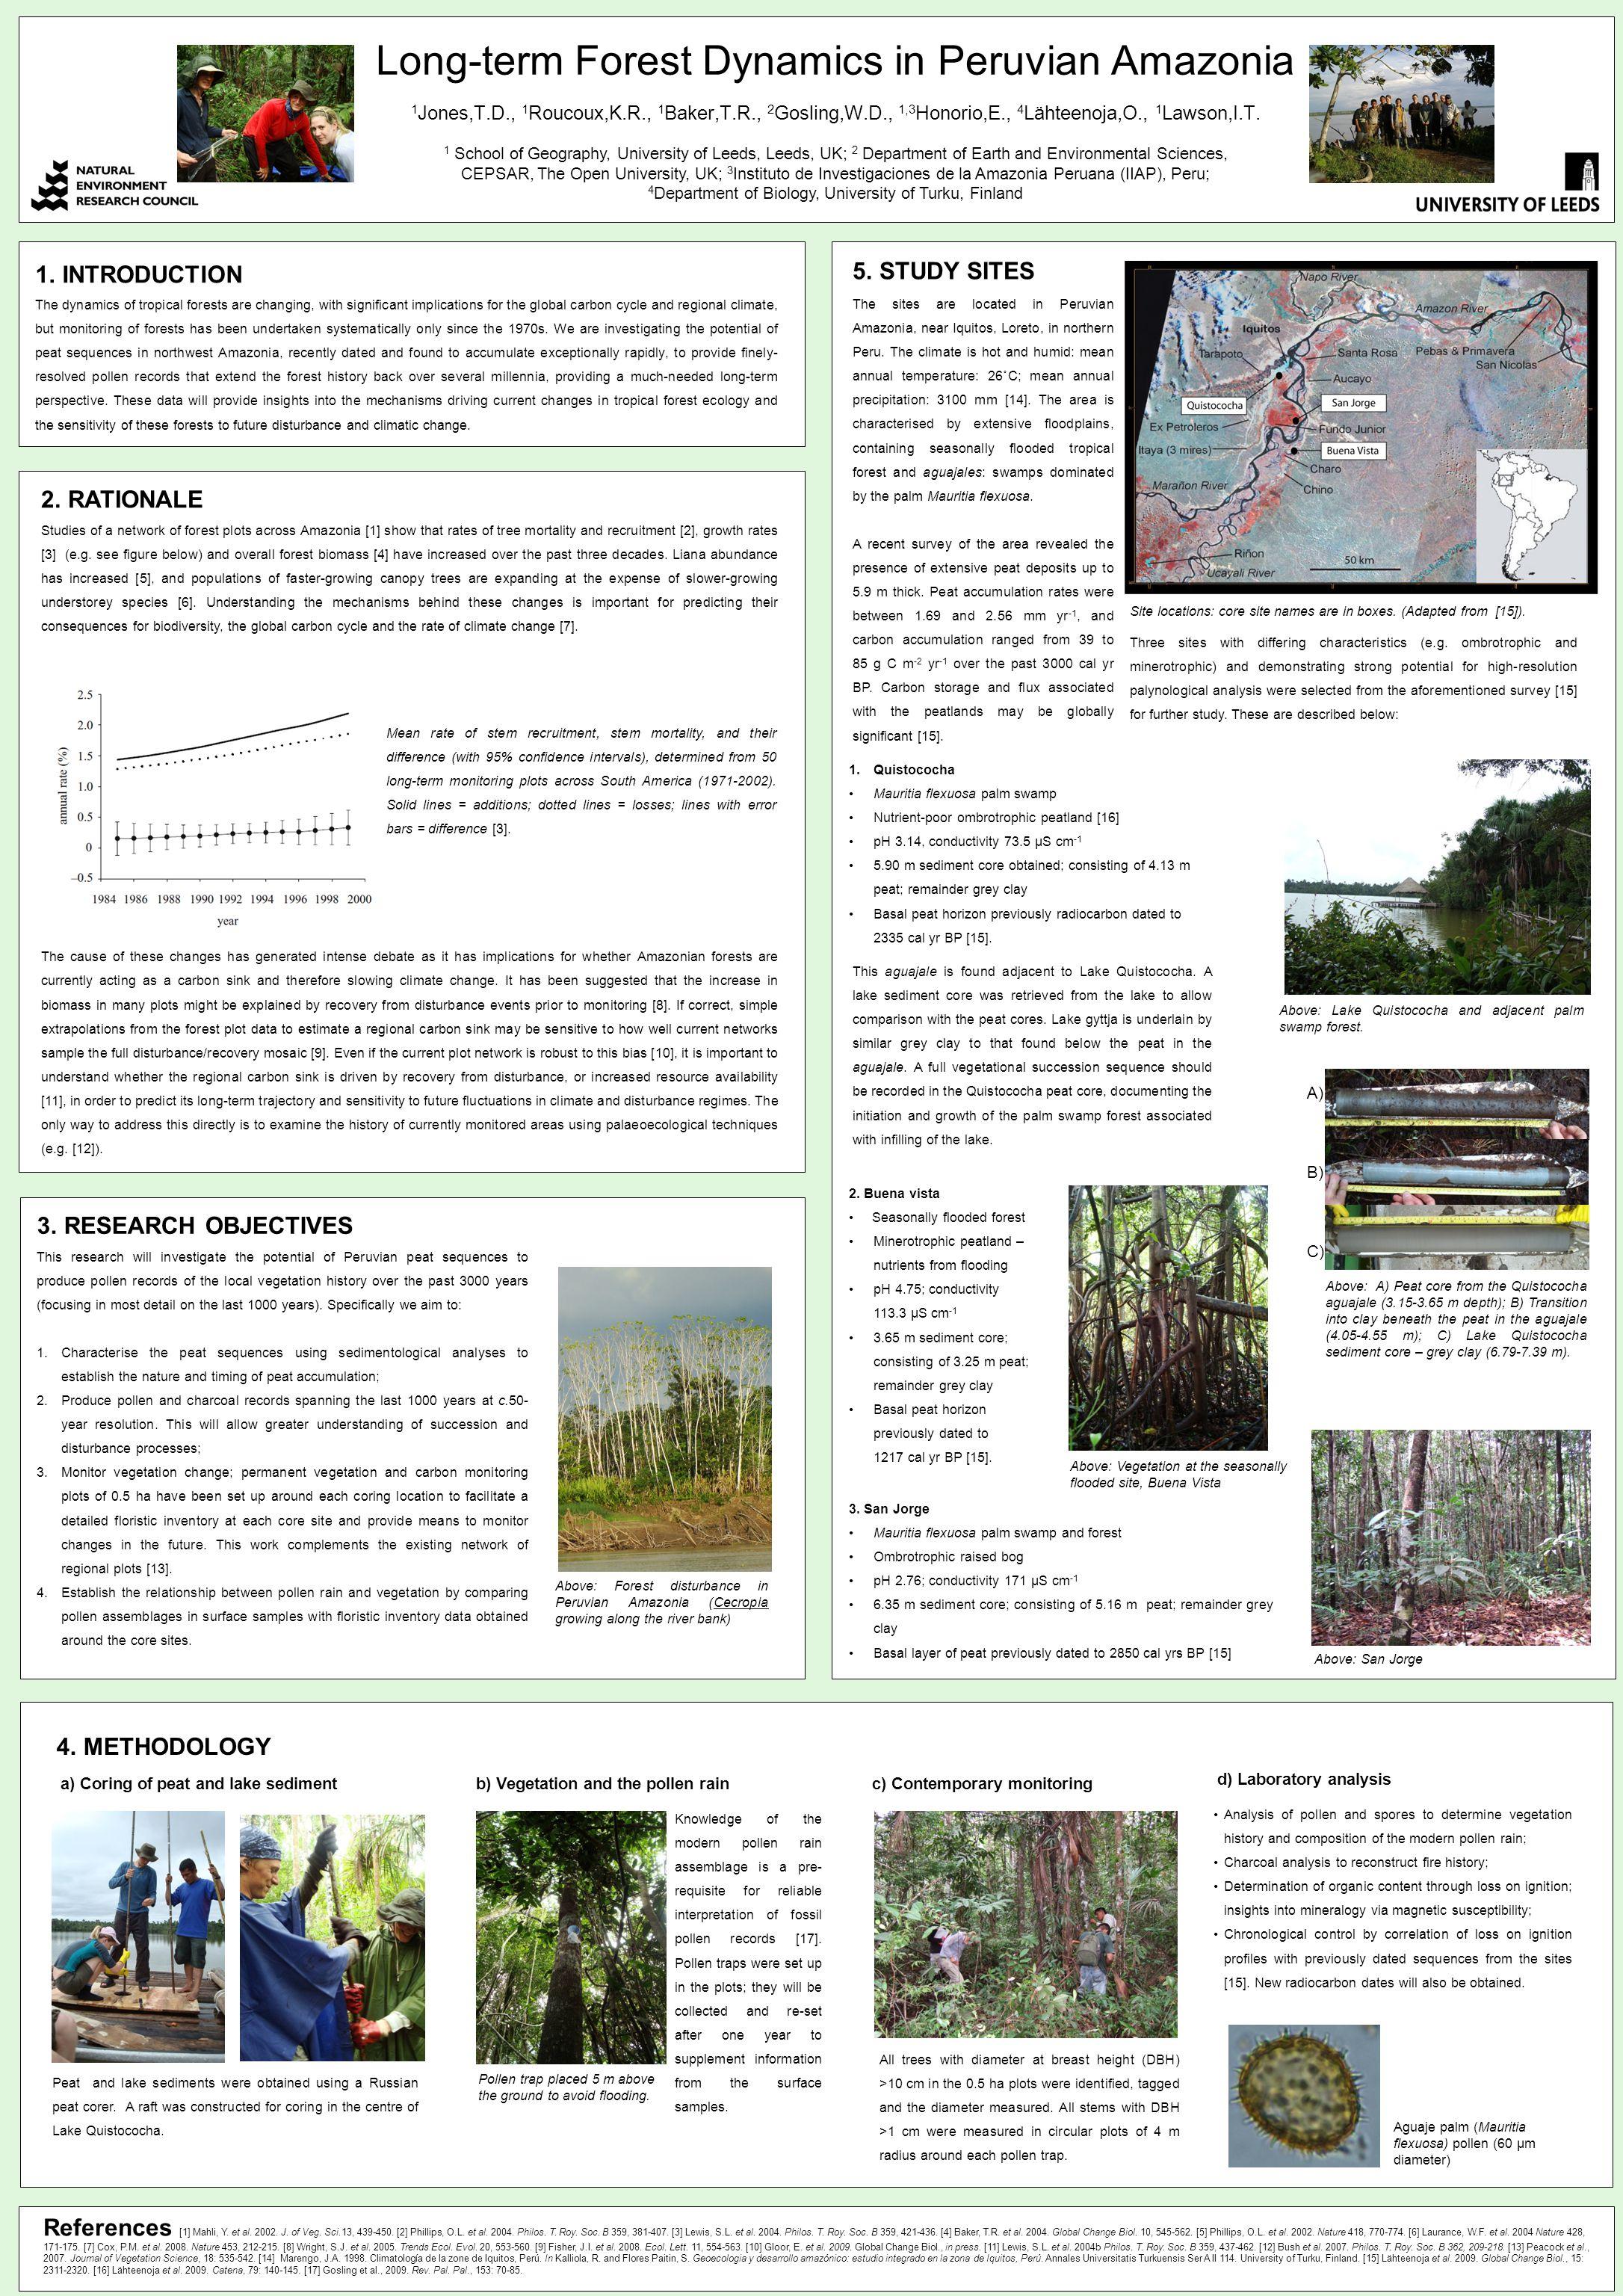 Long-term Forest Dynamics in Peruvian Amazonia 1 Jones,T.D., 1 Roucoux,K.R., 1 Baker,T.R., 2 Gosling,W.D., 1,3 Honorio,E., 4 Lähteenoja,O., 1 Lawson,I.T.